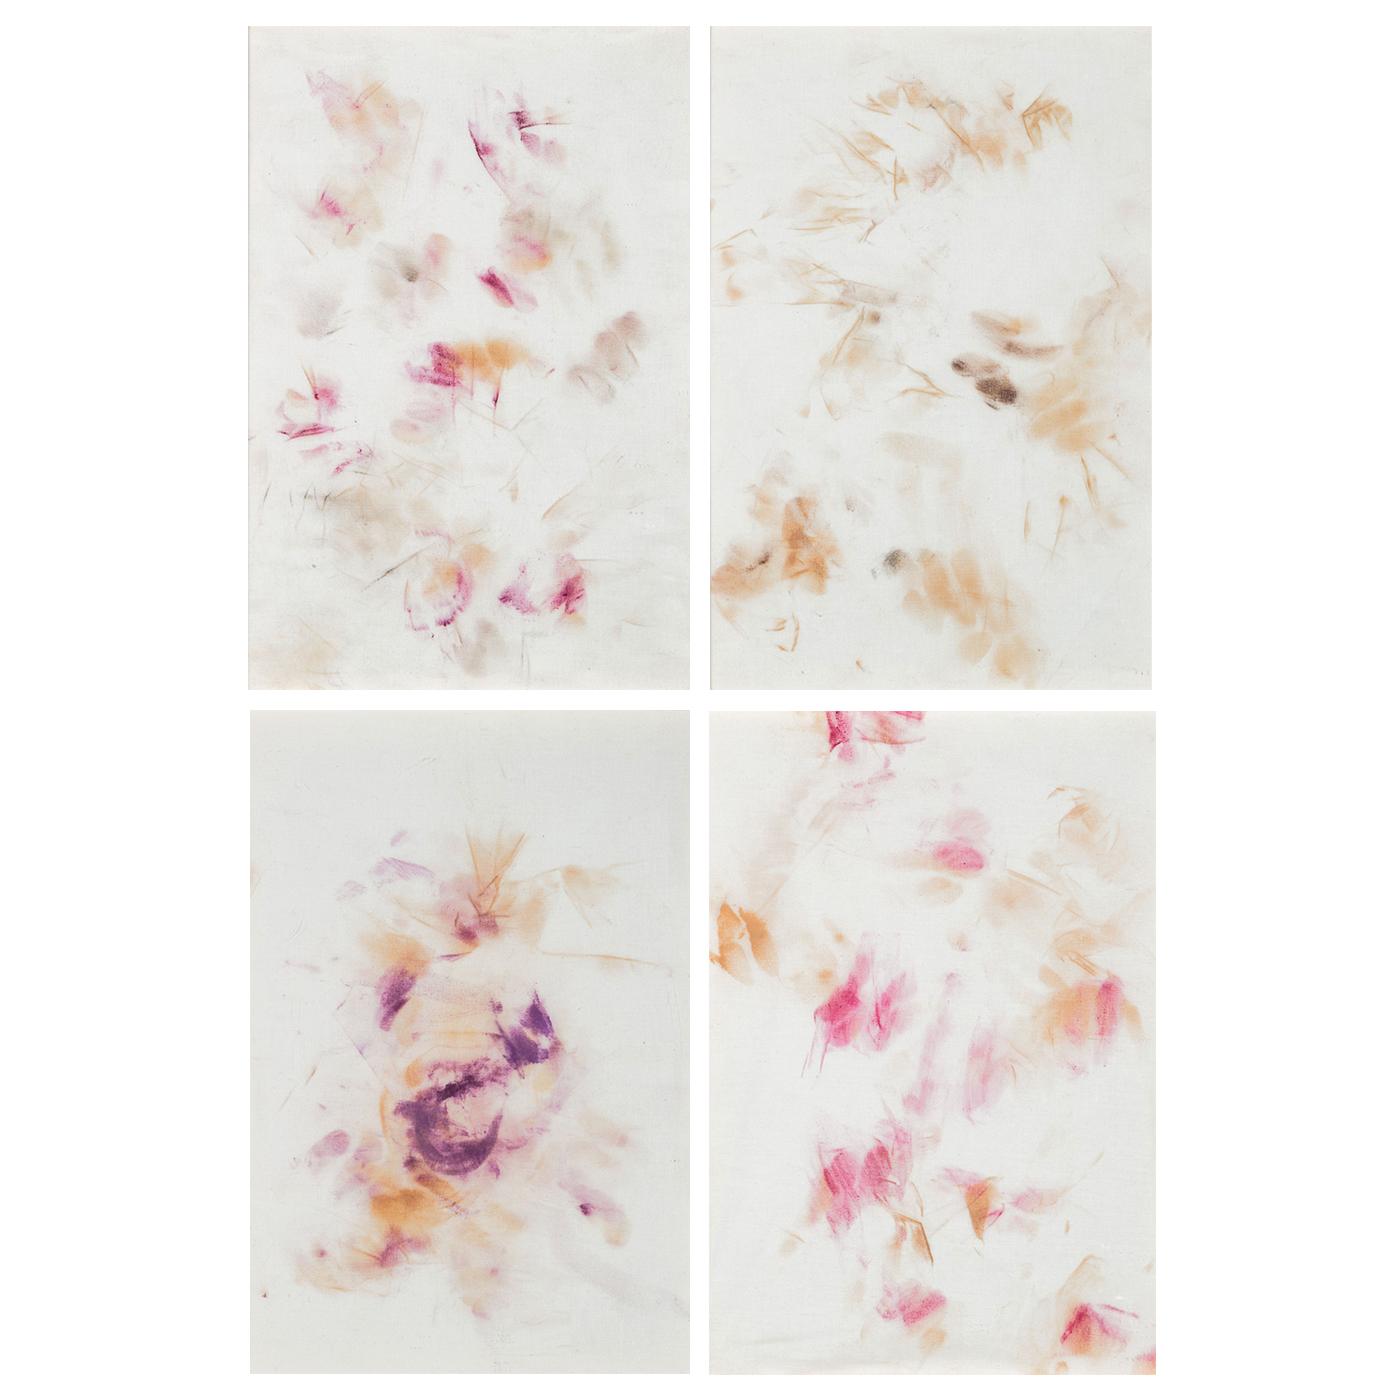 Stevie D. Spurgin - My Face of Fabric (Series 1-4)